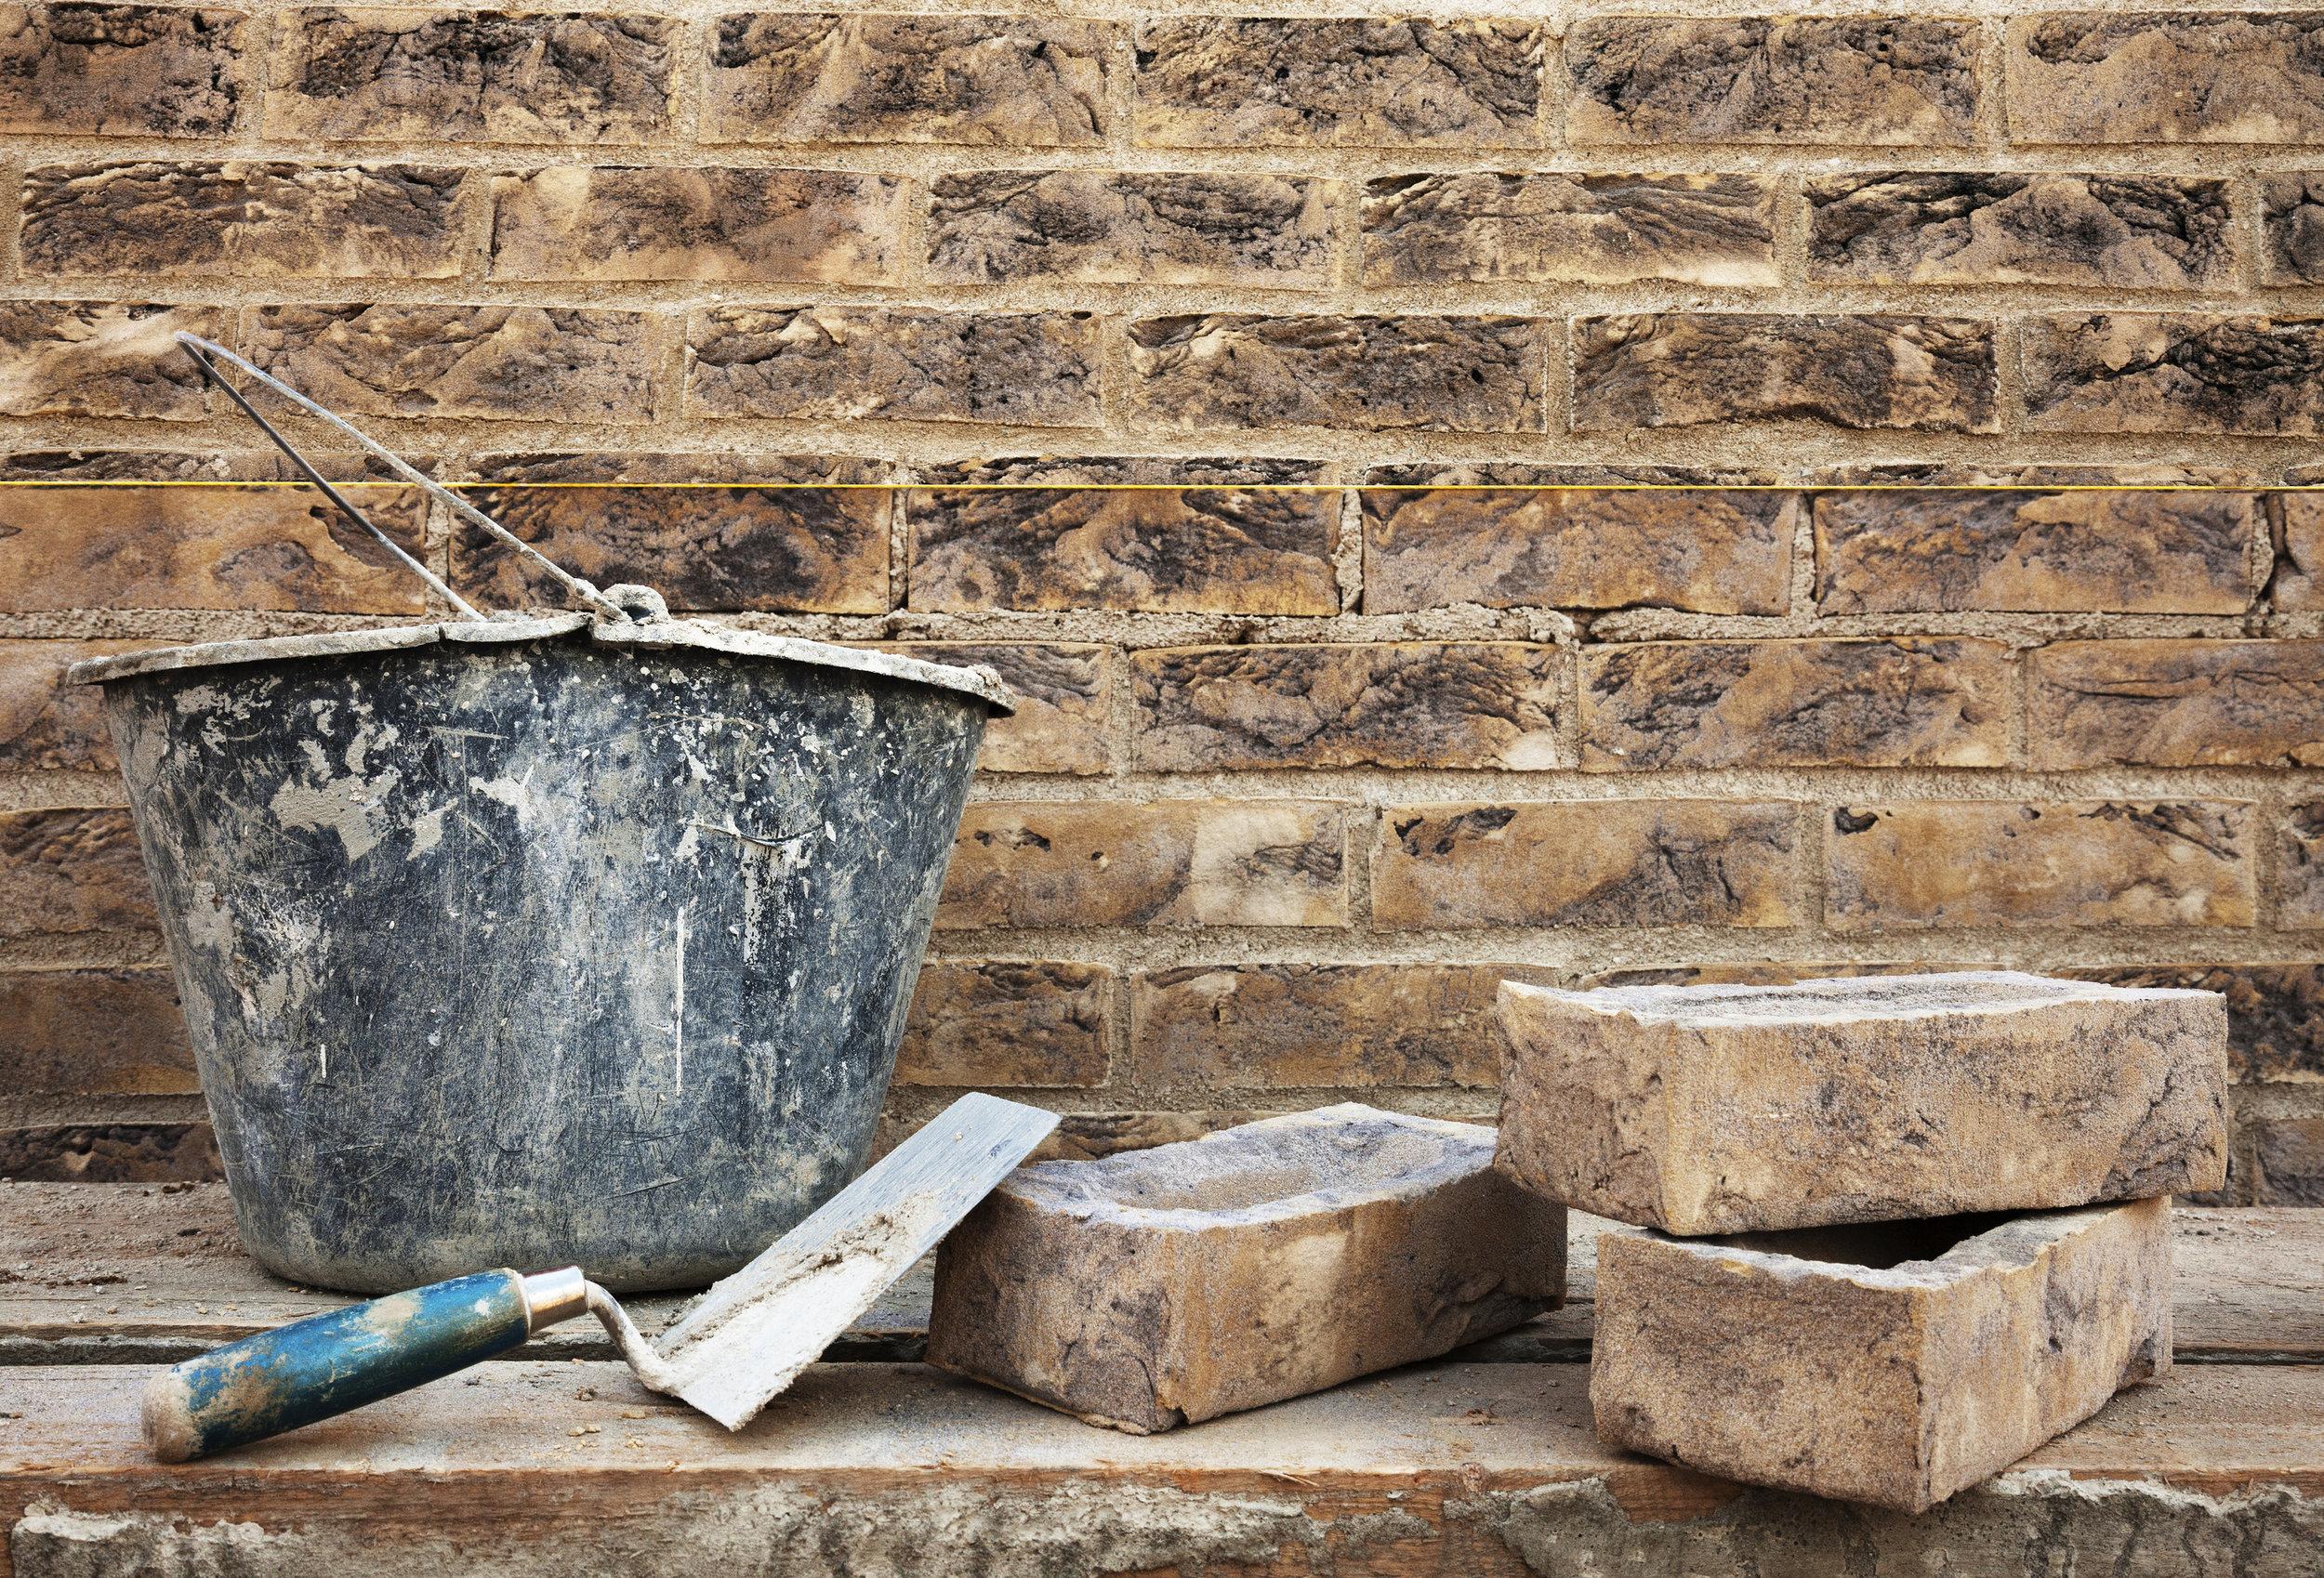 bigstock-Vintage-style-brickwork-and-co-99656633.jpg